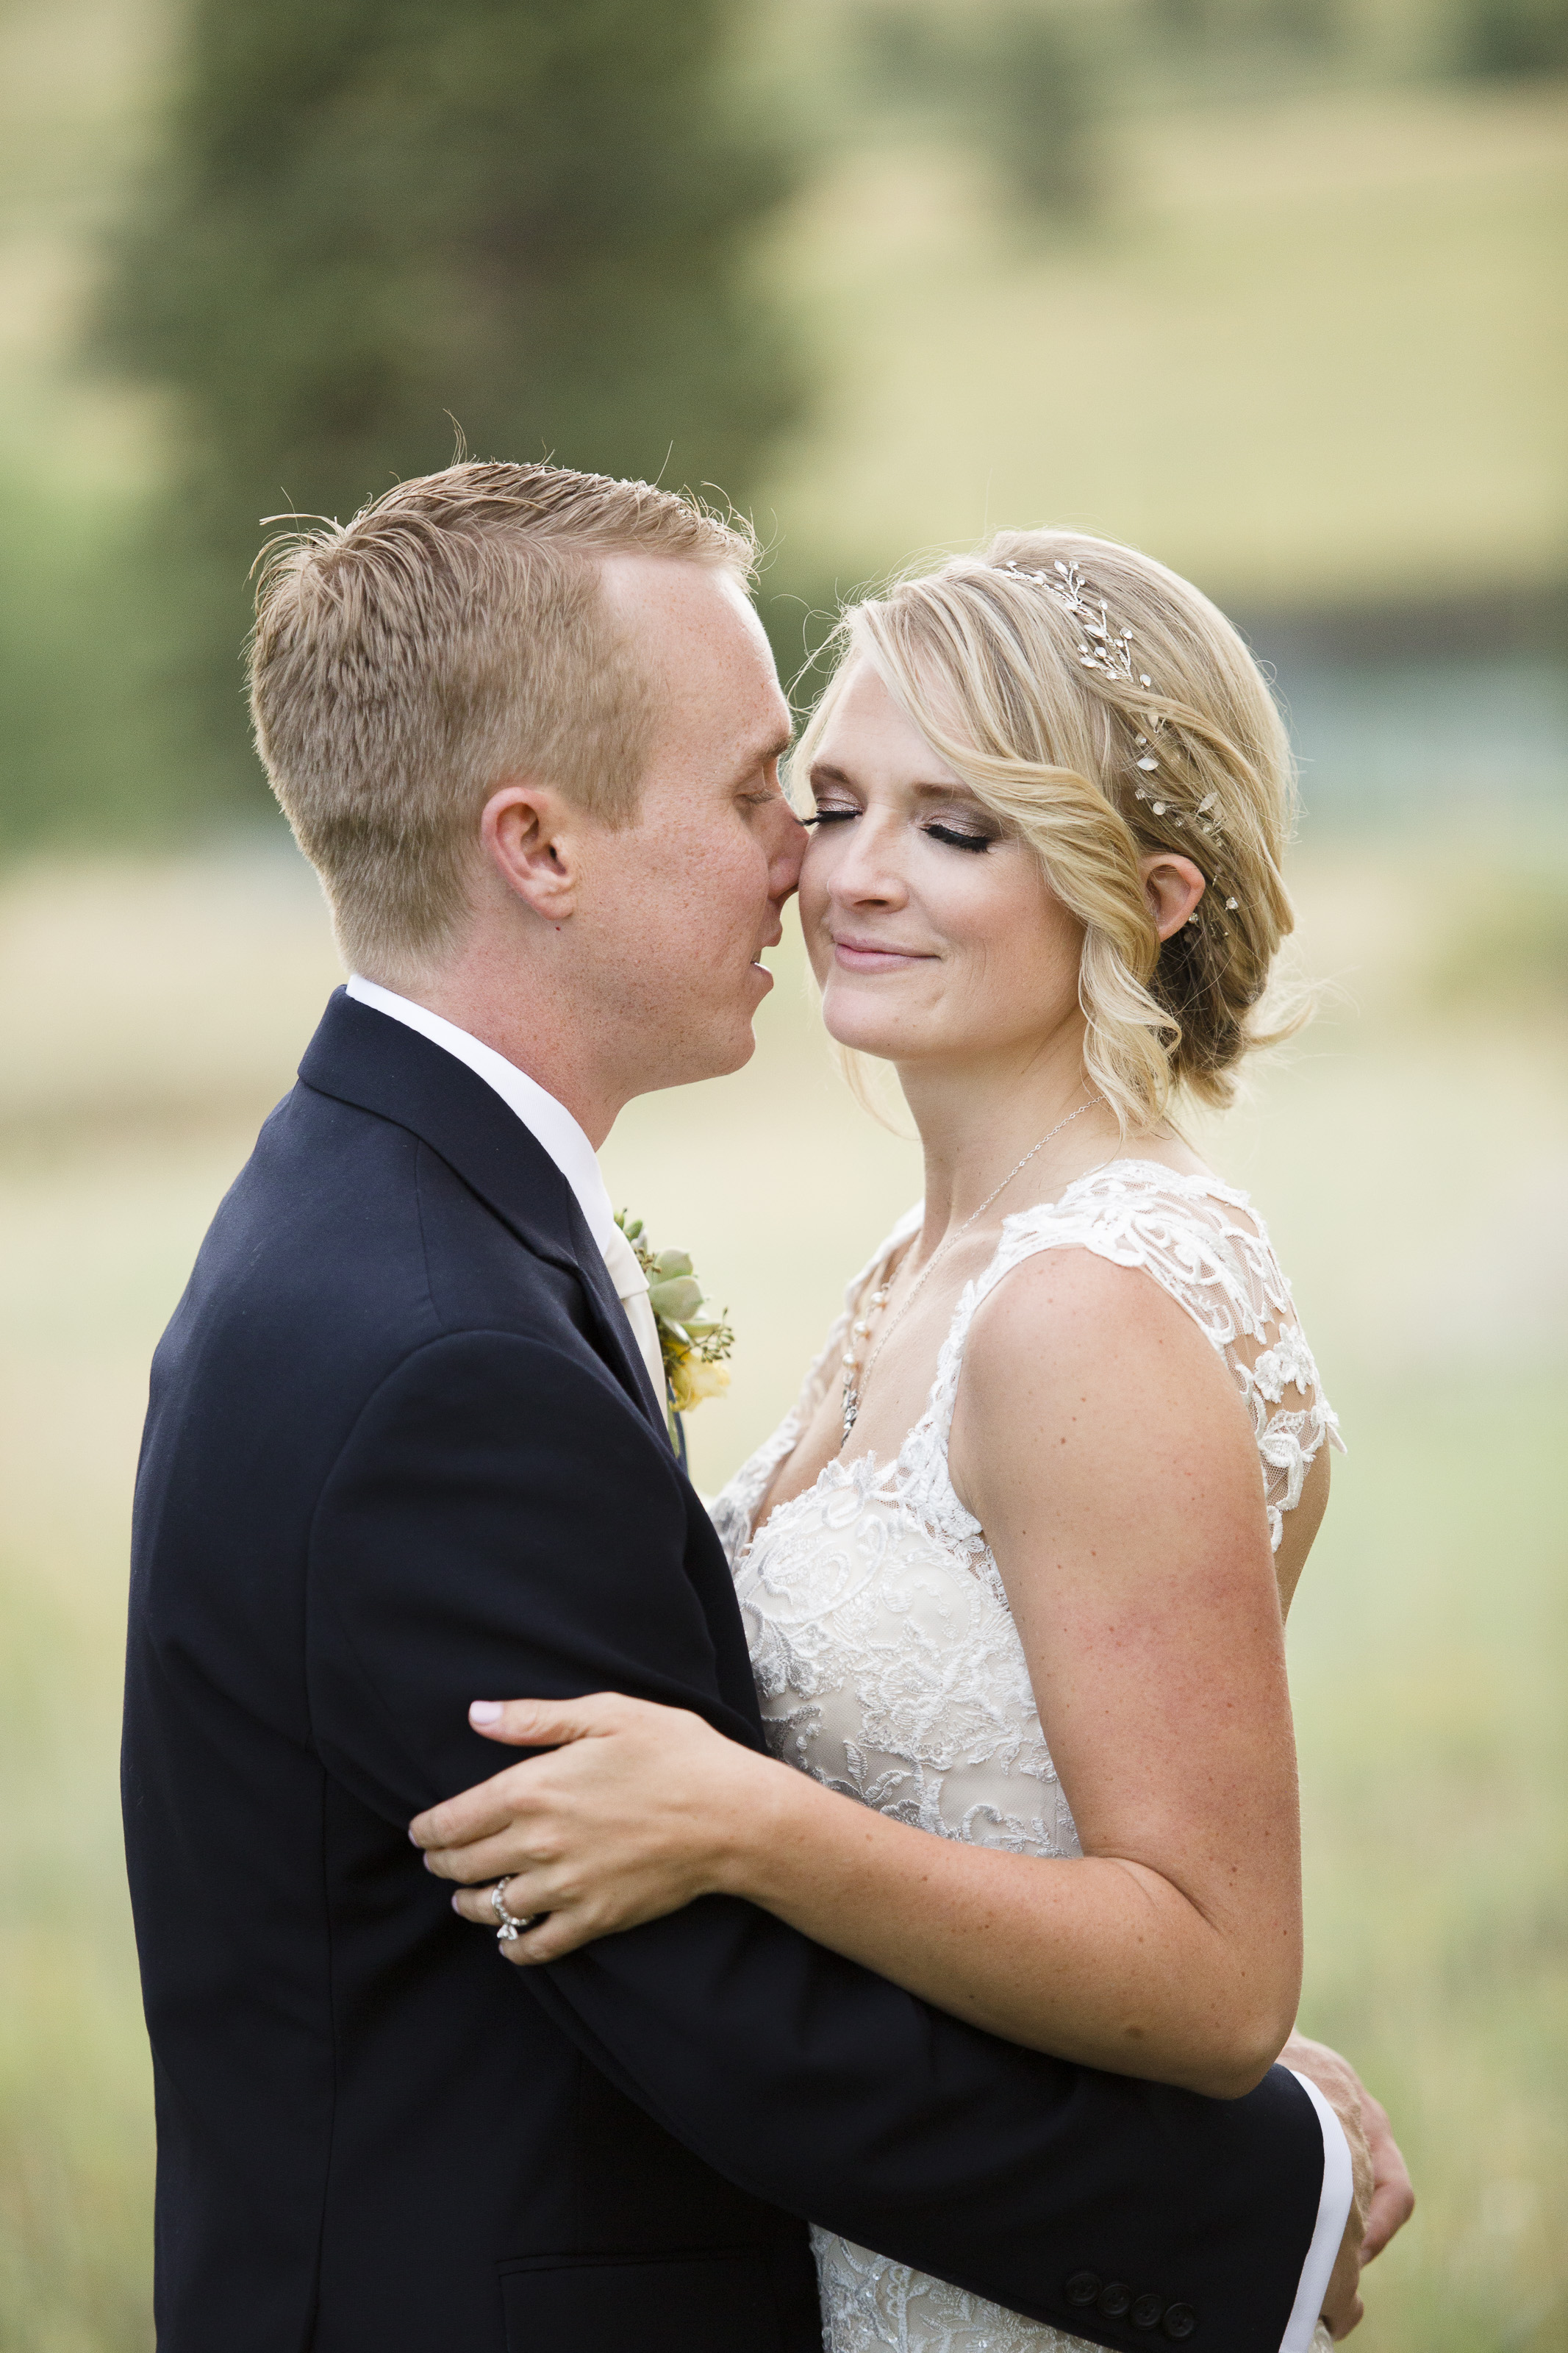 kristen-vance-mt-vernon-country-club-golden-colorado-wedding-2017-3.jpg